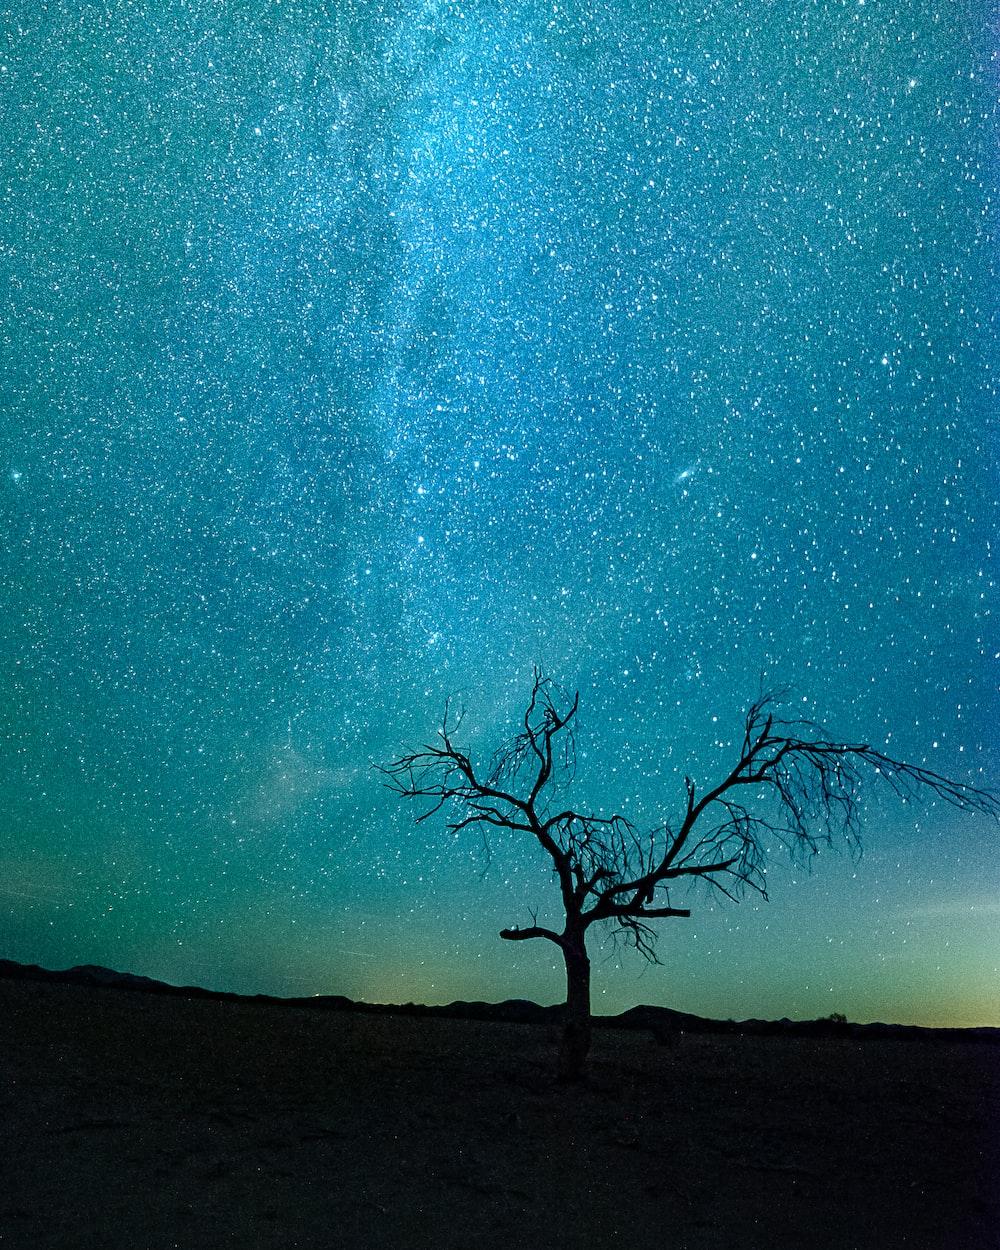 bare tree under starry night